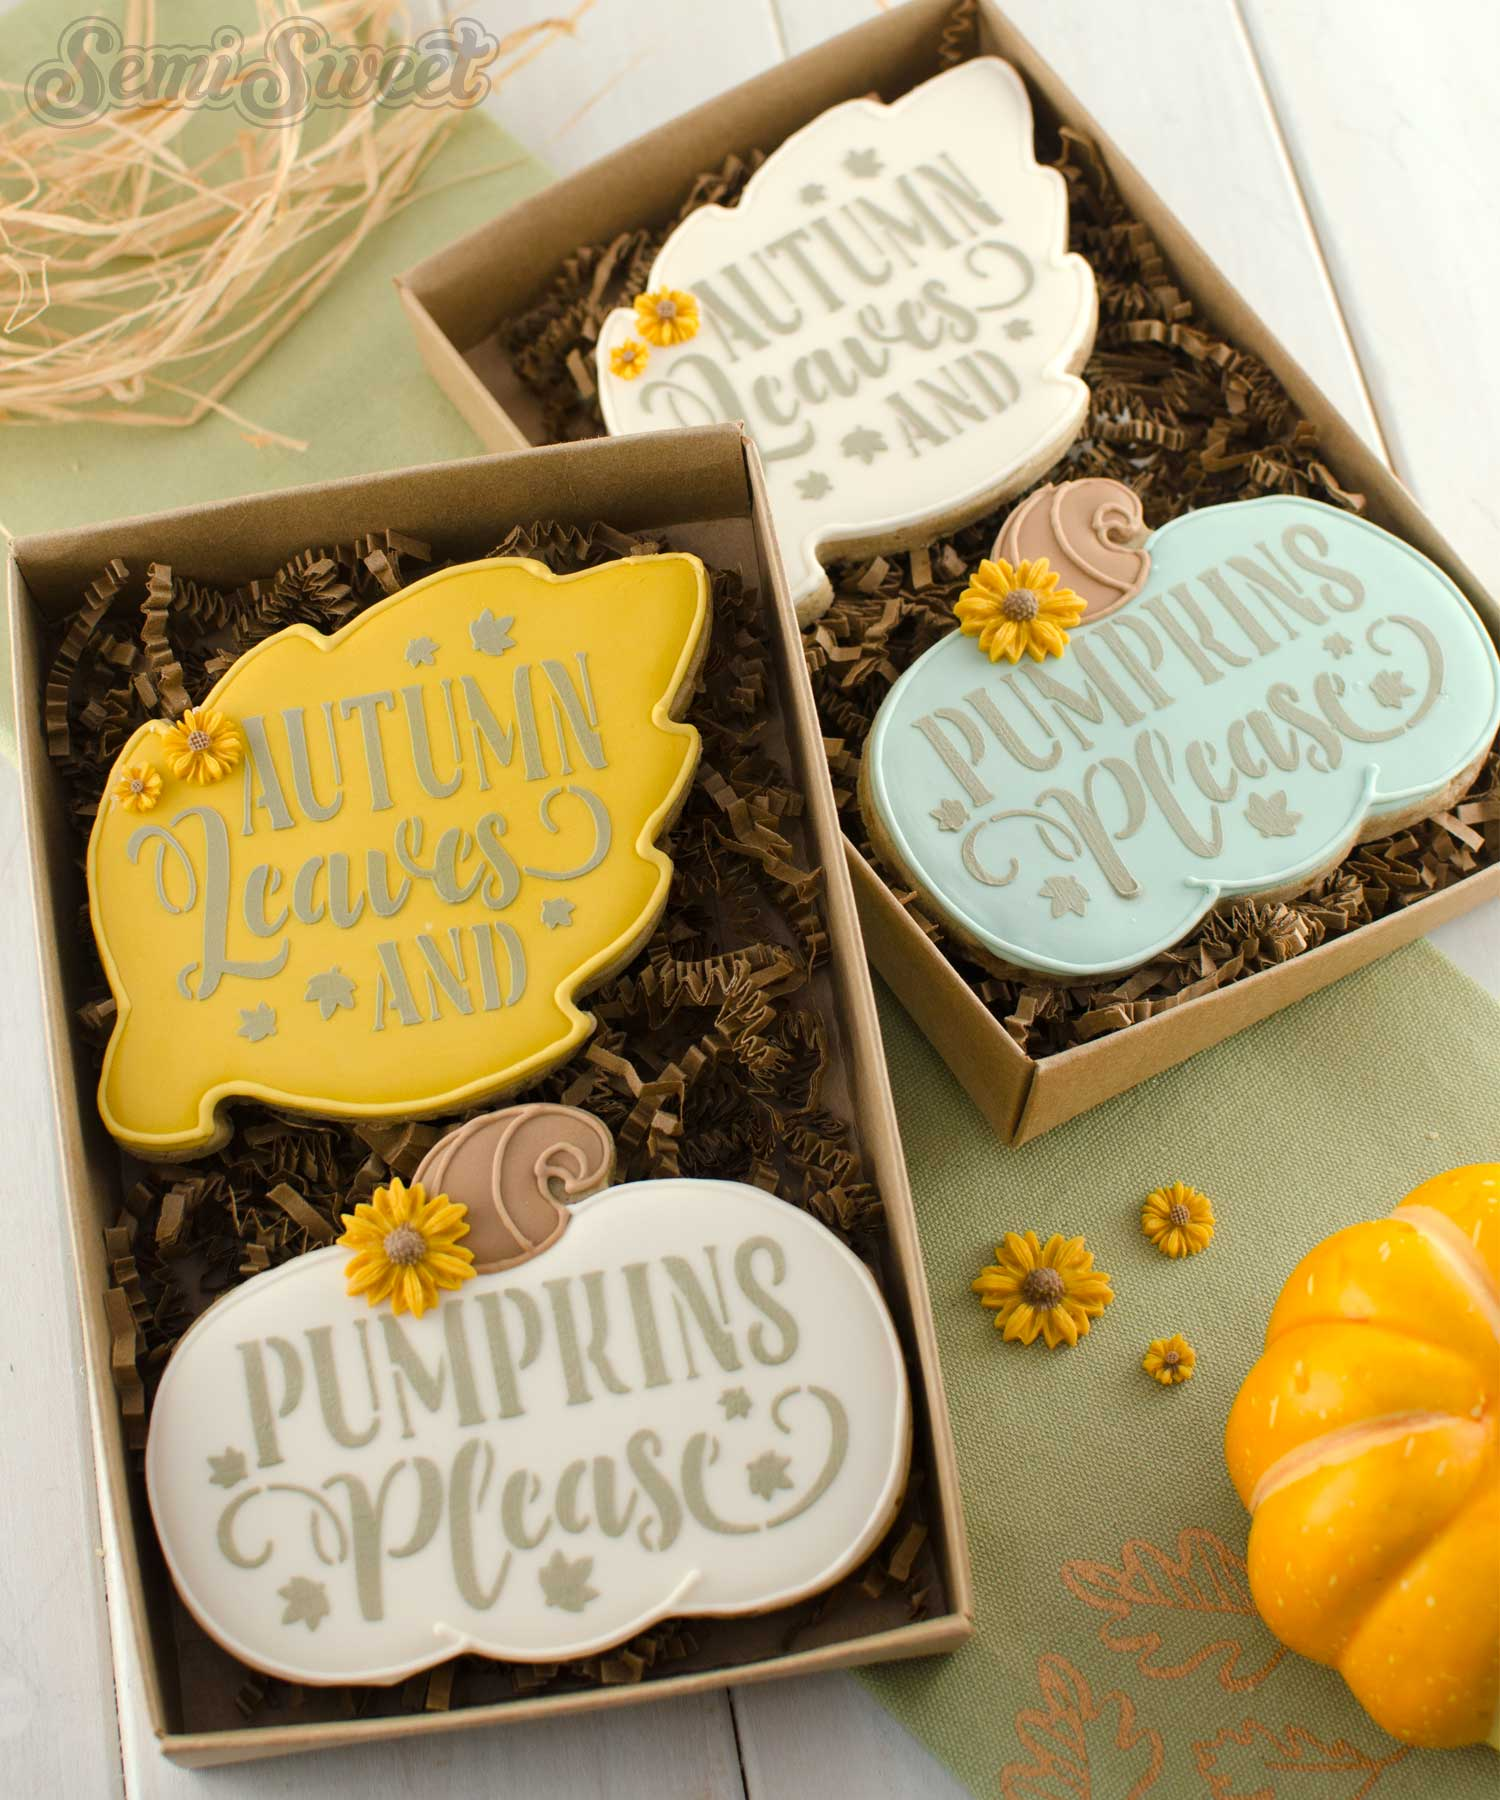 autumn leaves & pumpkins please cookie set